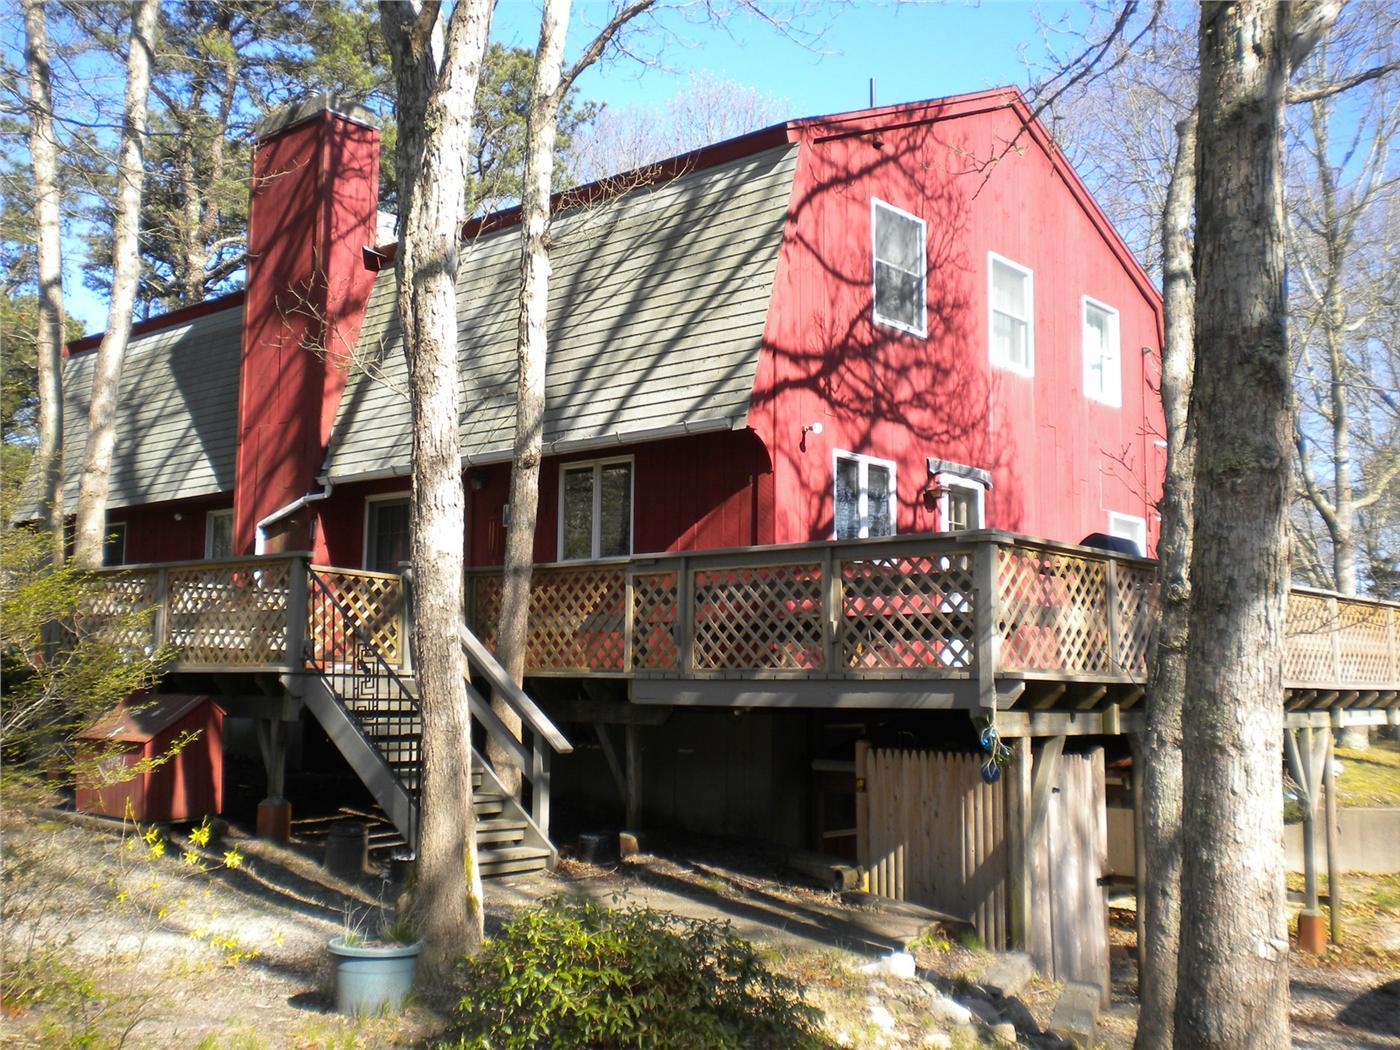 Wellfleet Vacation Rental Home In Cape Cod Ma 02667 Id 16769